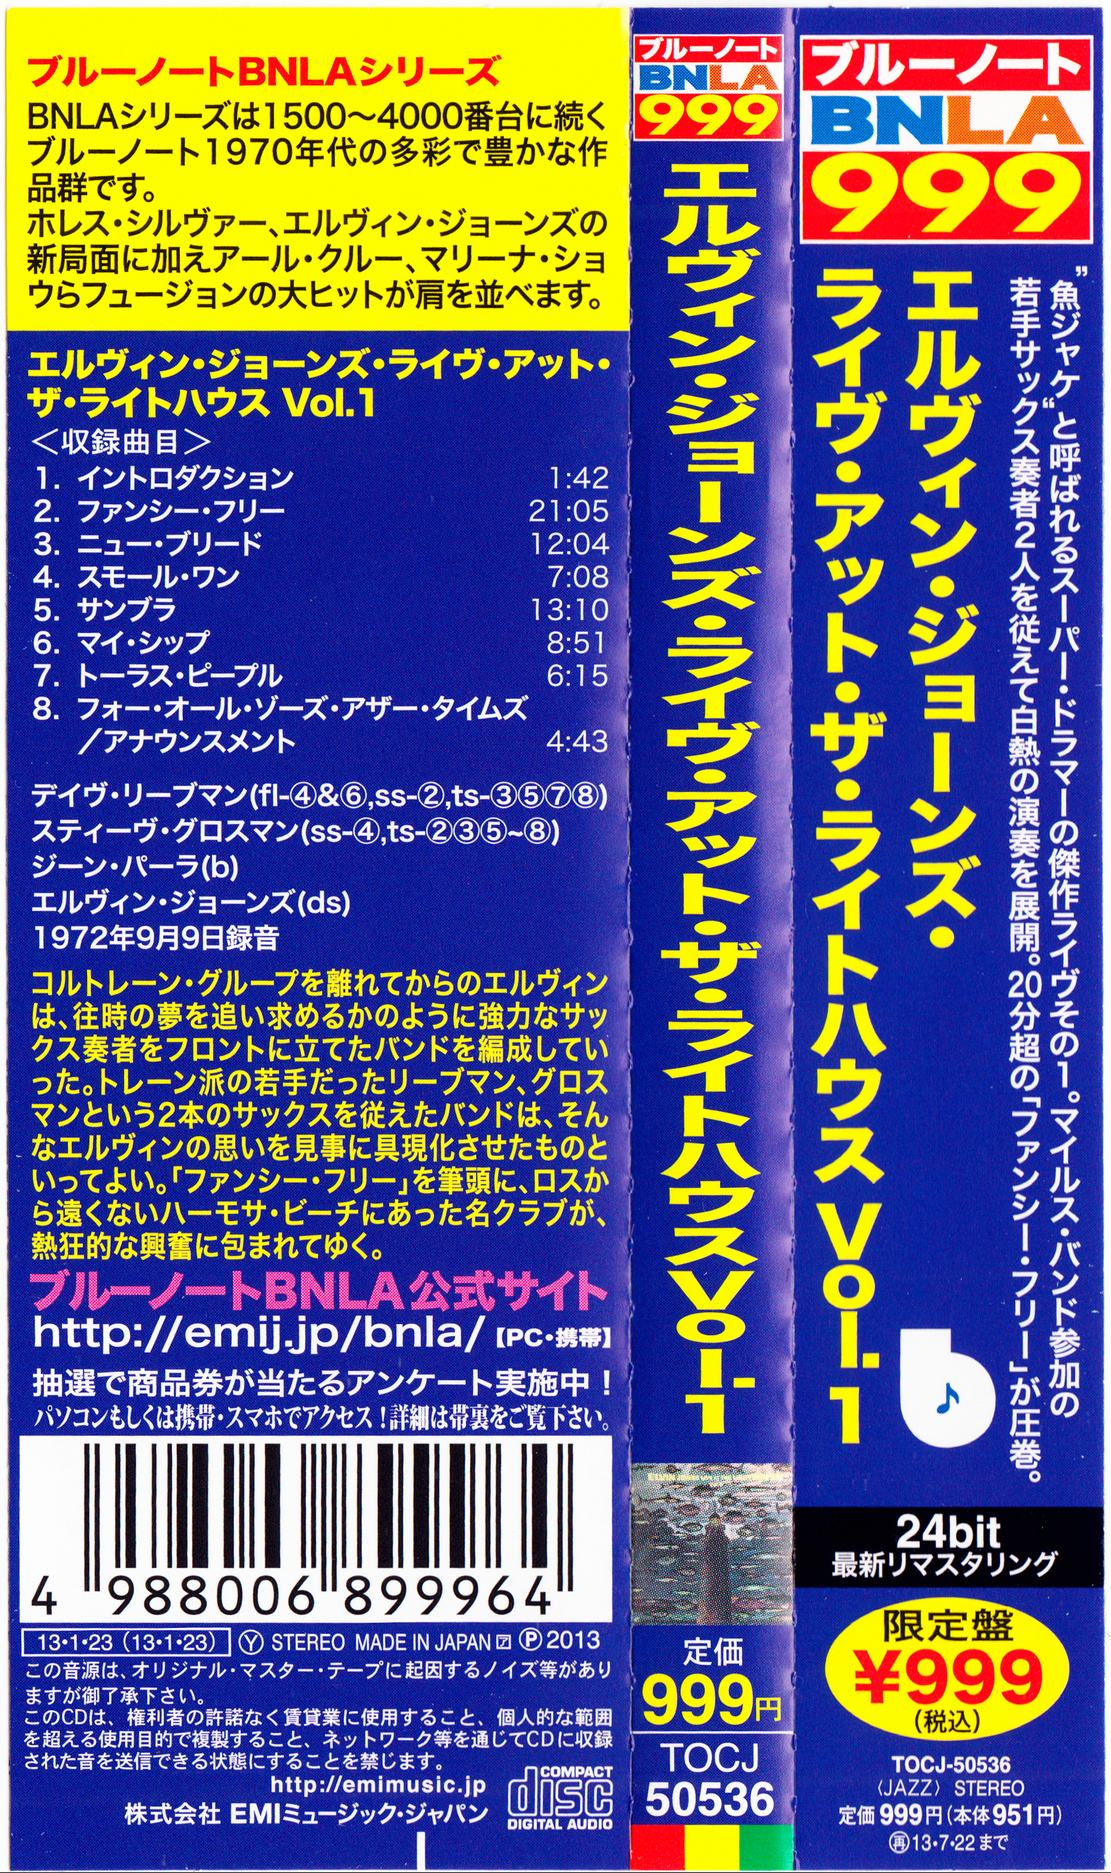 Elvin Jones - Live At The Lighthouse Vol.1 (1972) {2013 Japanese BNLA Series 24-bit Remaster TOCJ-50536}